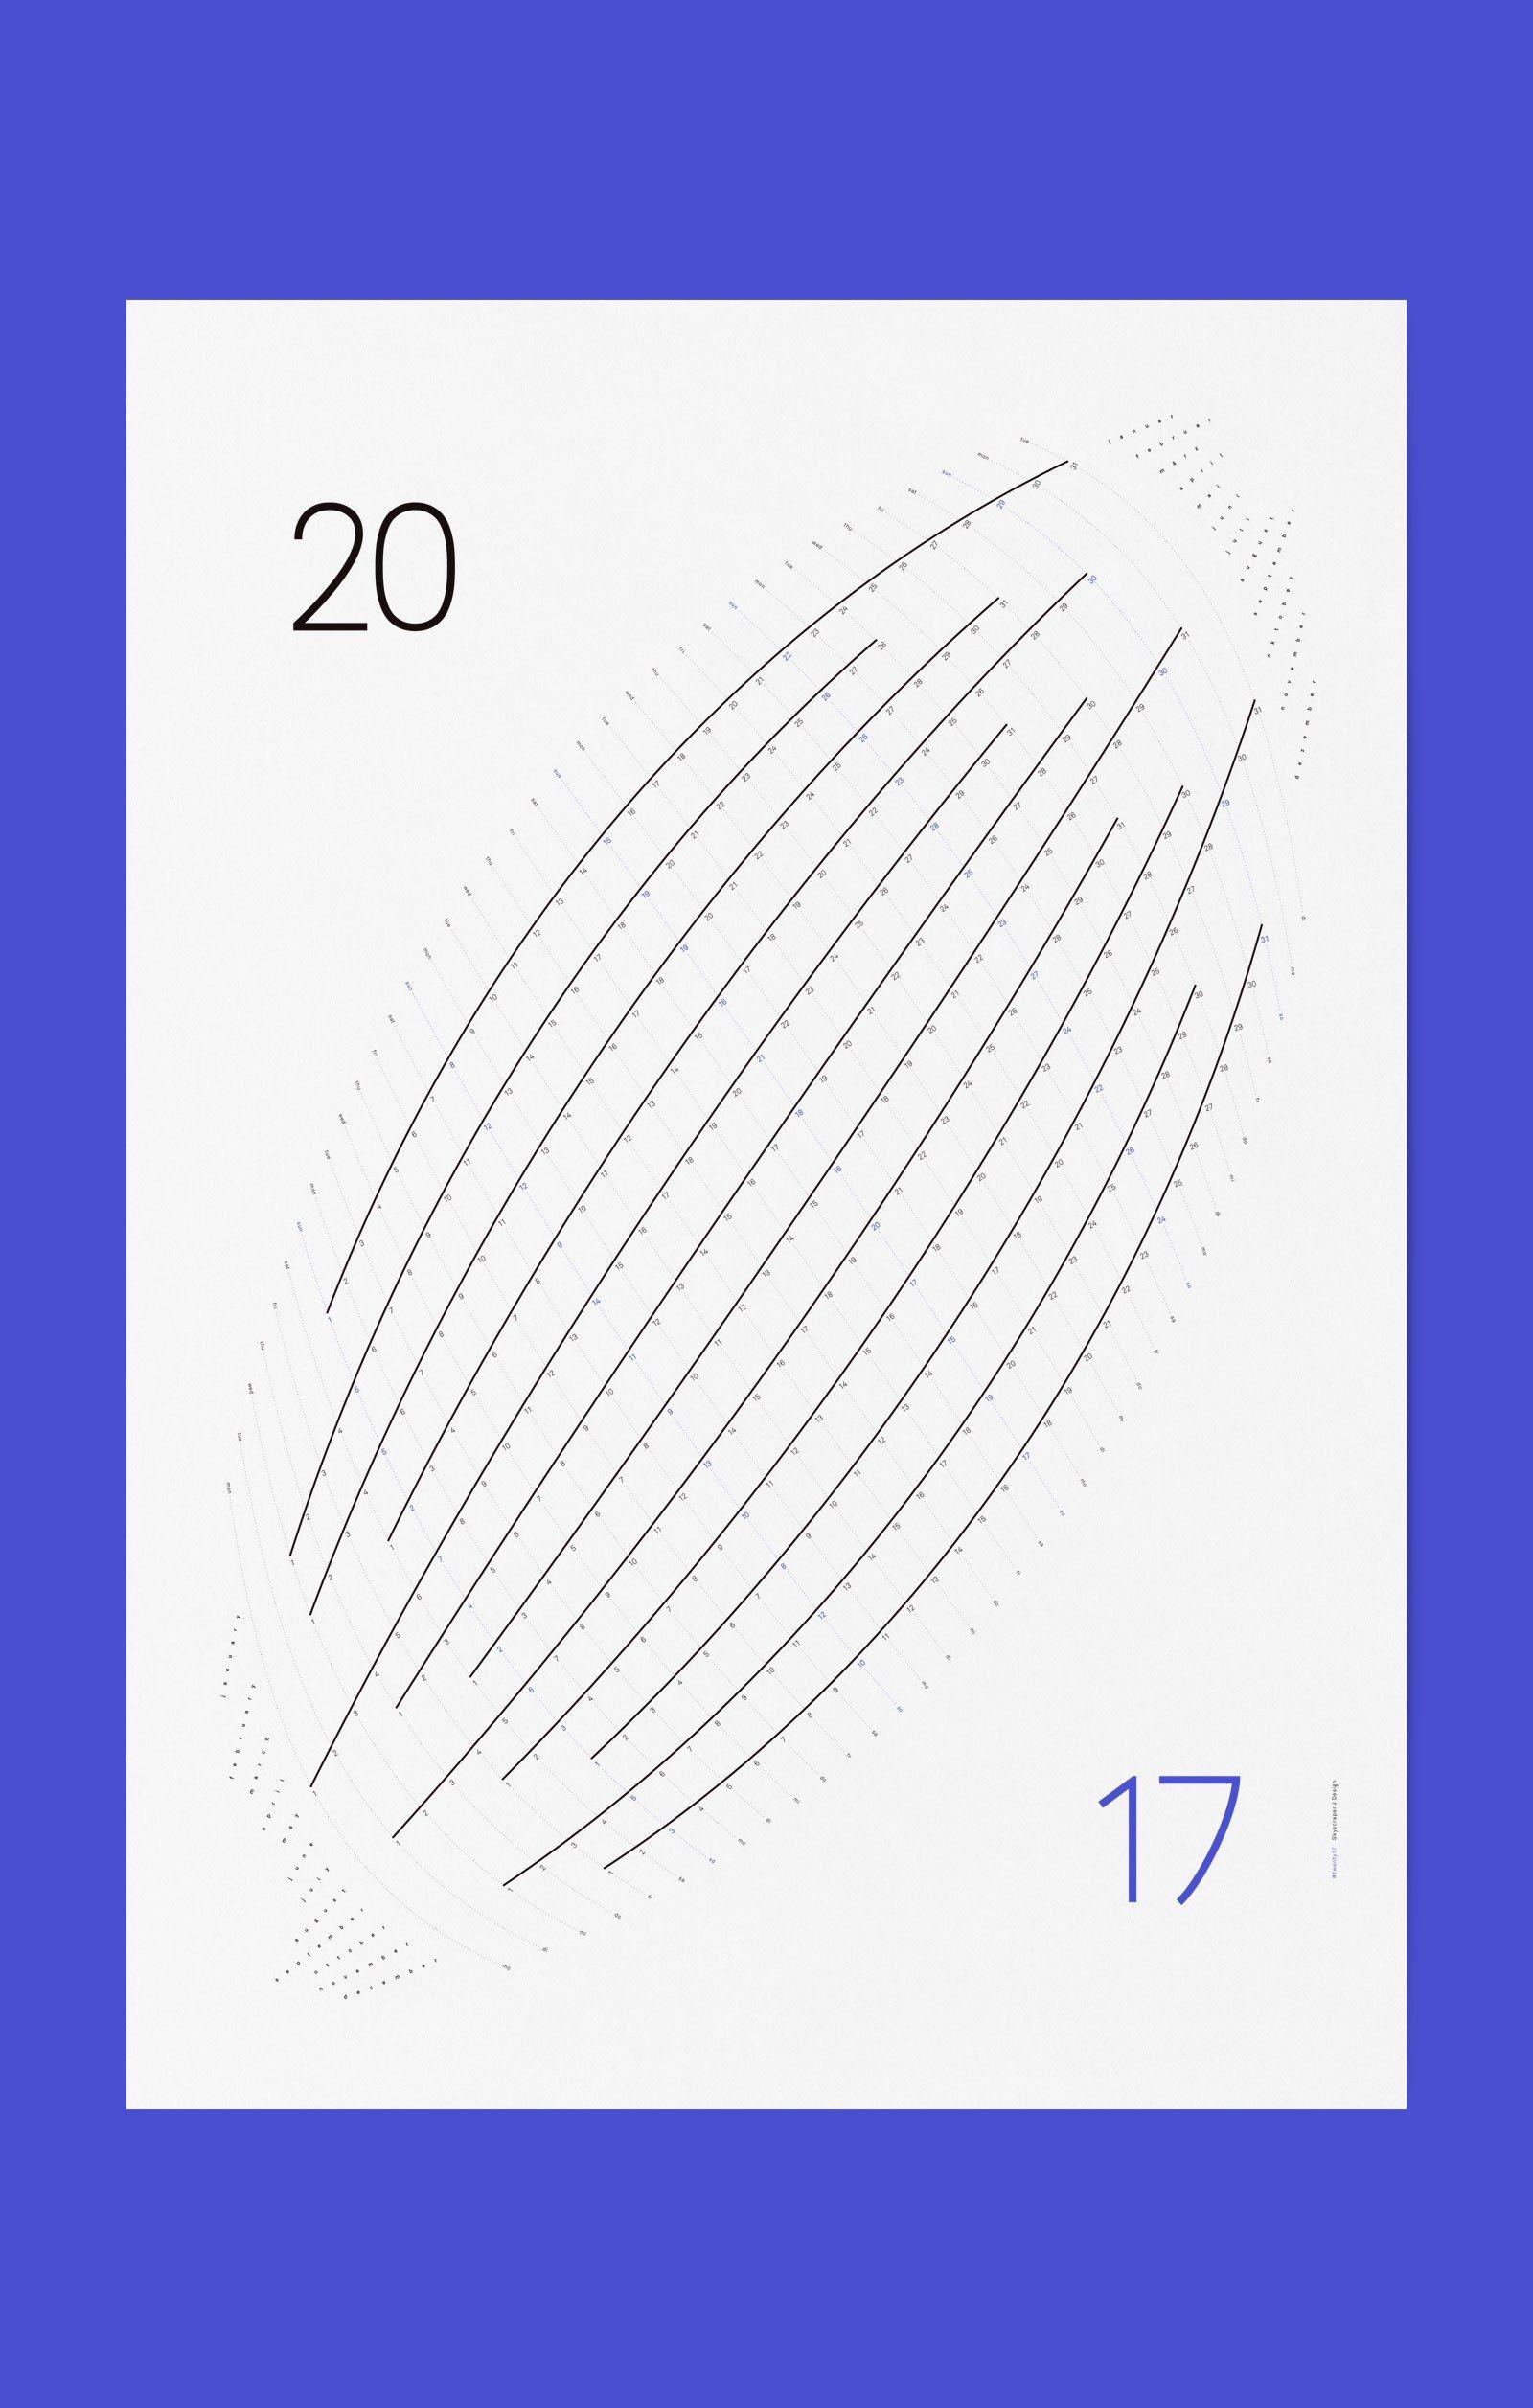 #Designkalender 2017 Wandkalender »Twenty17. Rise« © Sebastian Jakl von Skyscraper J Design, Wien